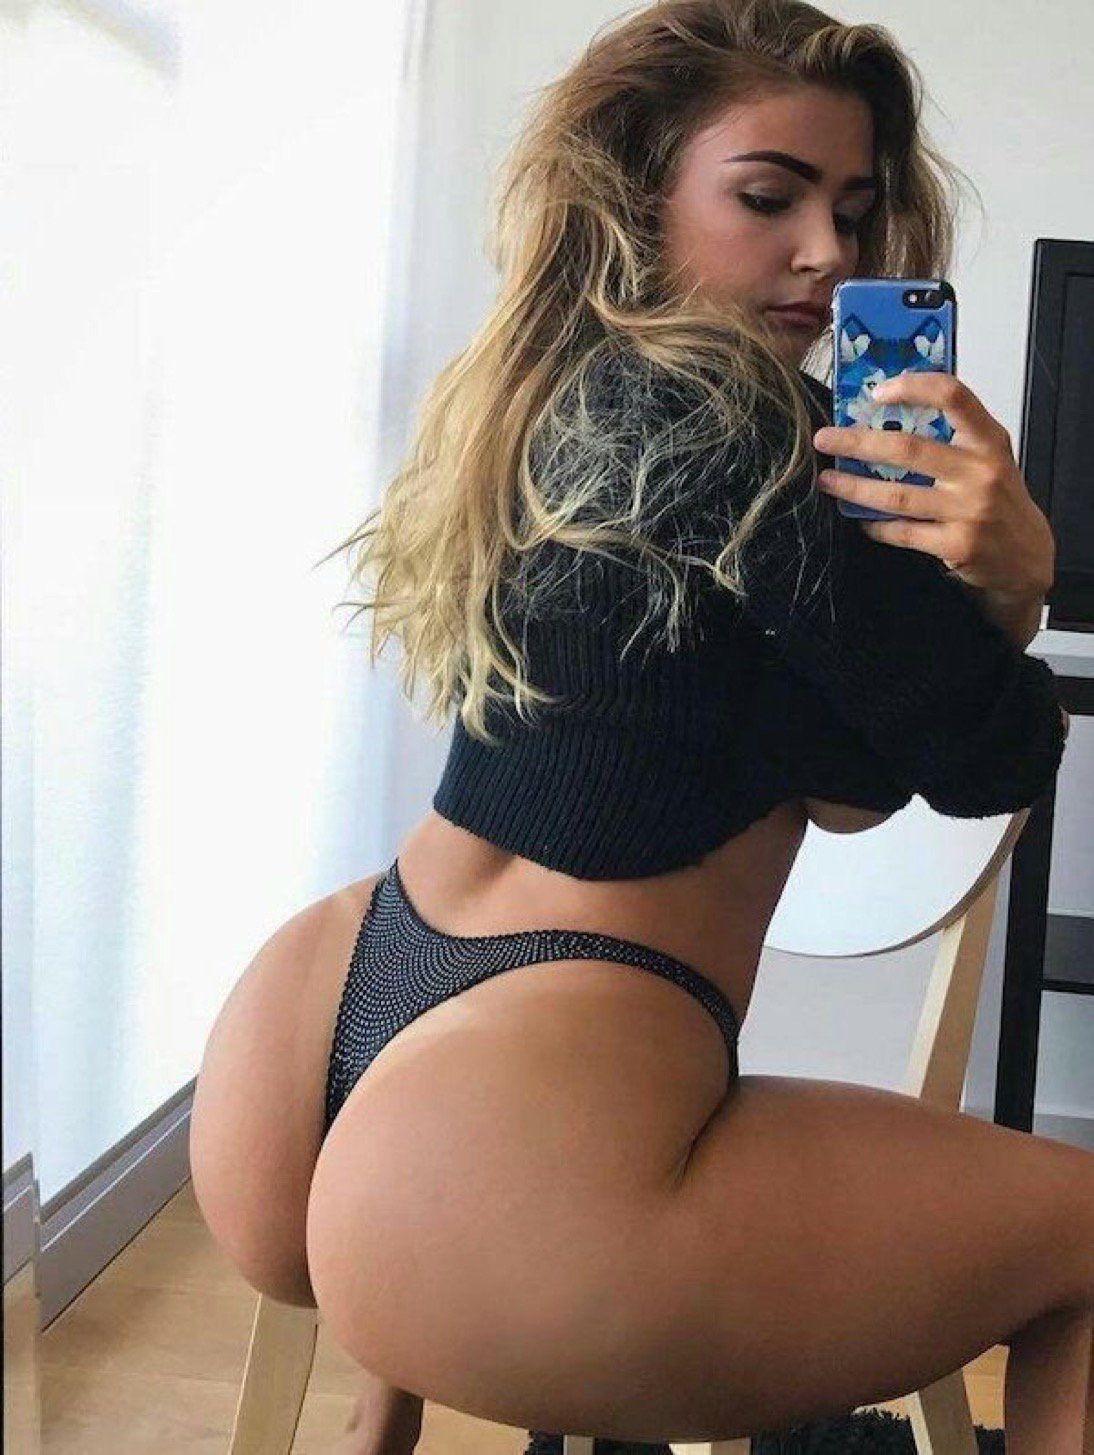 phat booty whooty | sexy mirrors | pinterest | latin girls, curvy